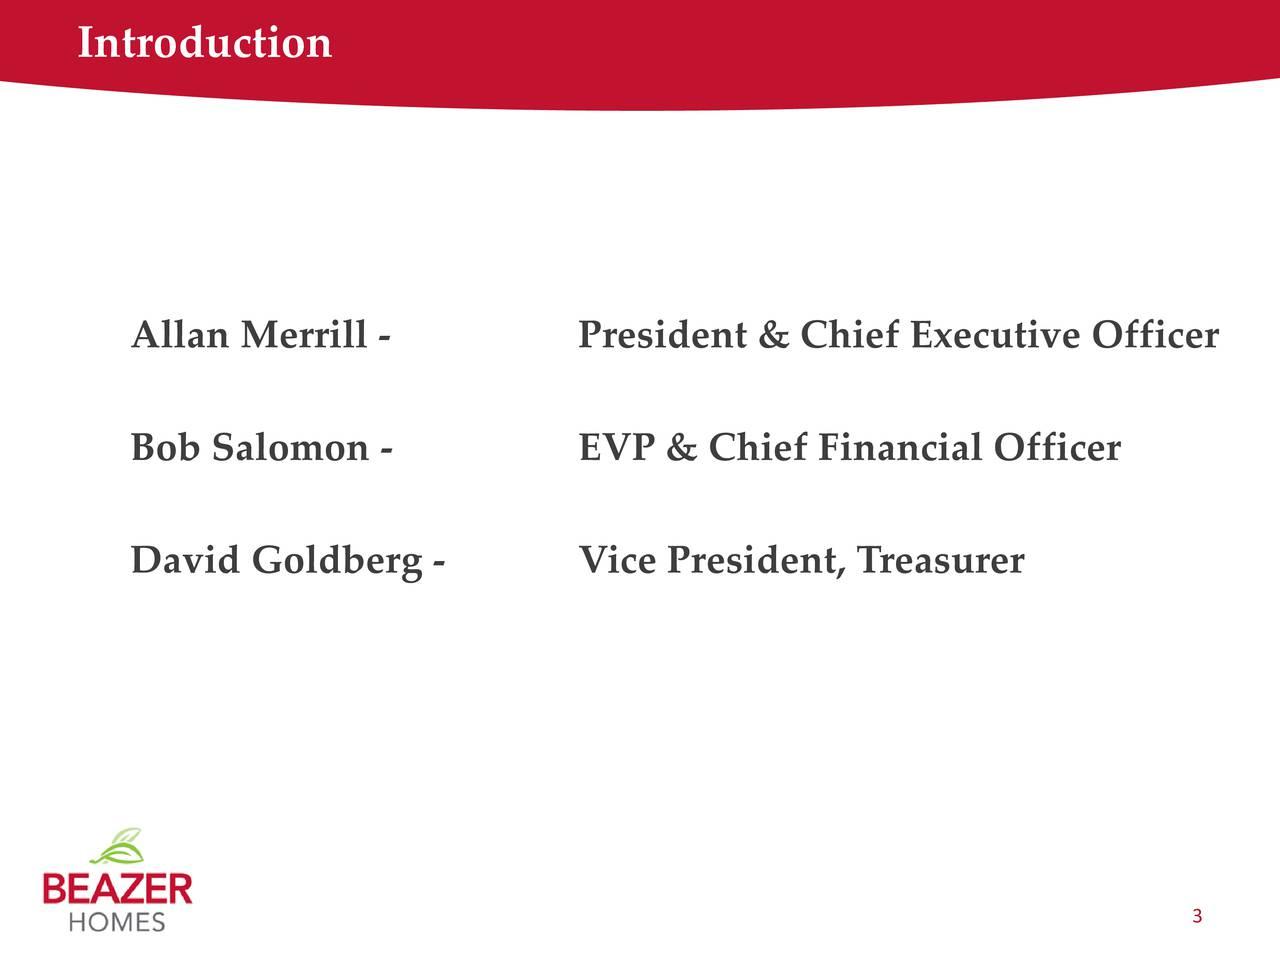 Allan Merrill - President & Chief Executive Officer Bob Salomon - EVP & Chief Financial Officer David Goldberg - Vice President, Treasurer 3